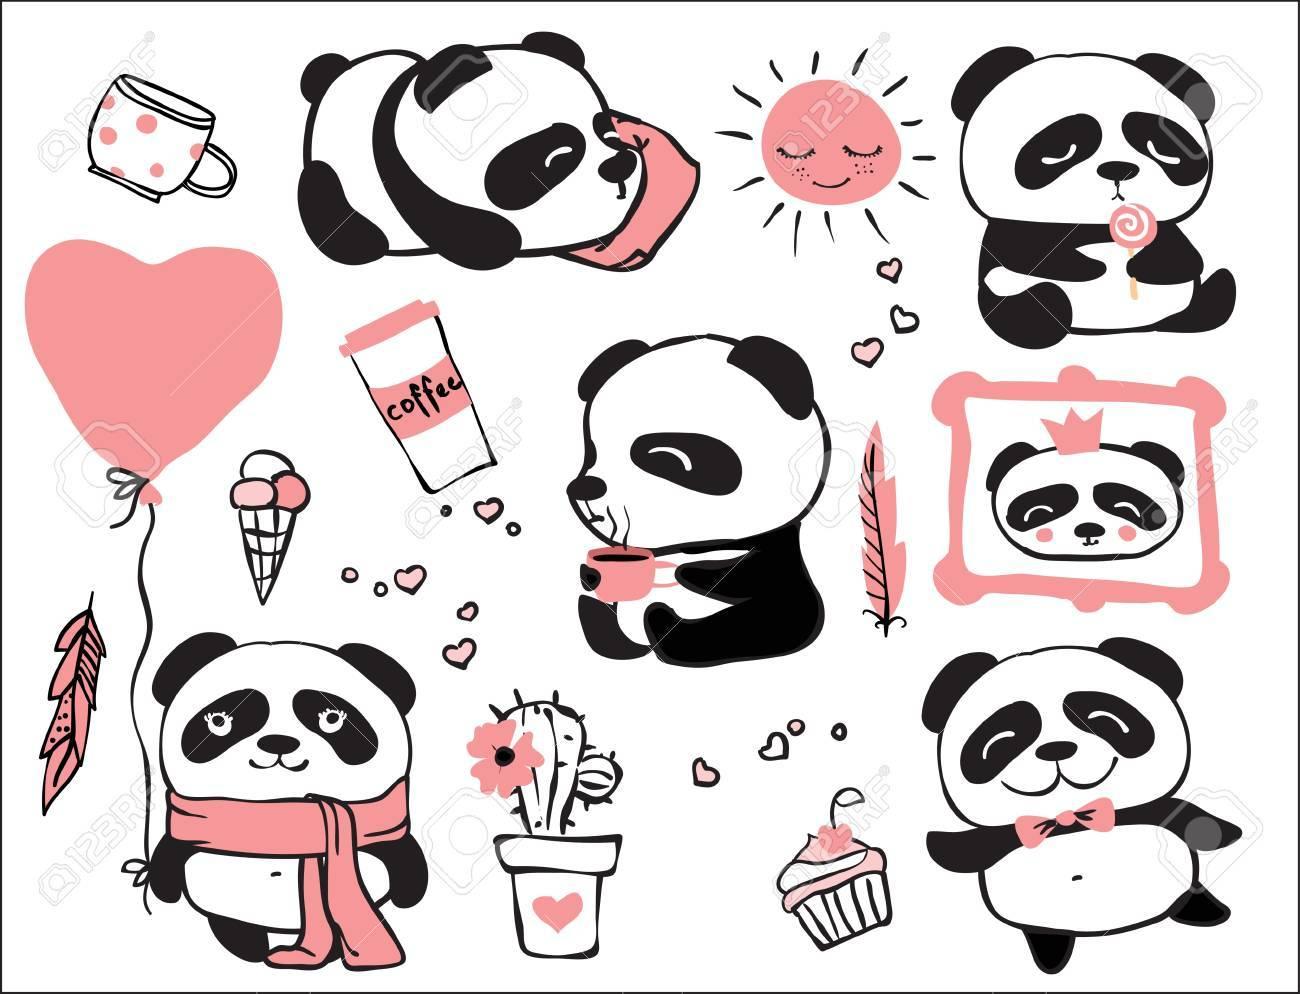 panda doodle kid set simple design of cute pandas royalty free